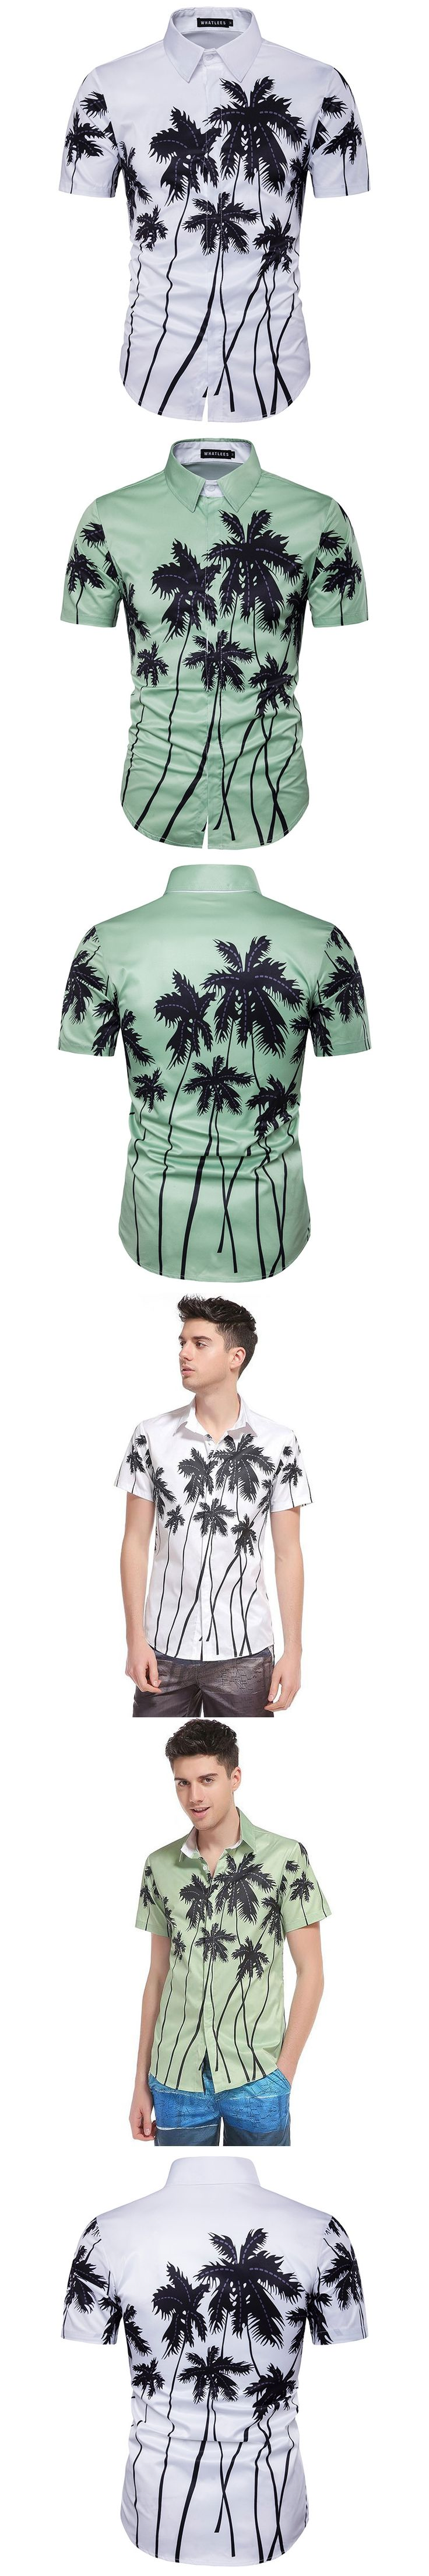 2017 Summer New Men Hawaii 3D Palm Tree Print Short Sleeve Shirt Fashion Casual Flower Shirt Sandy Beach Men Shirt High Quality